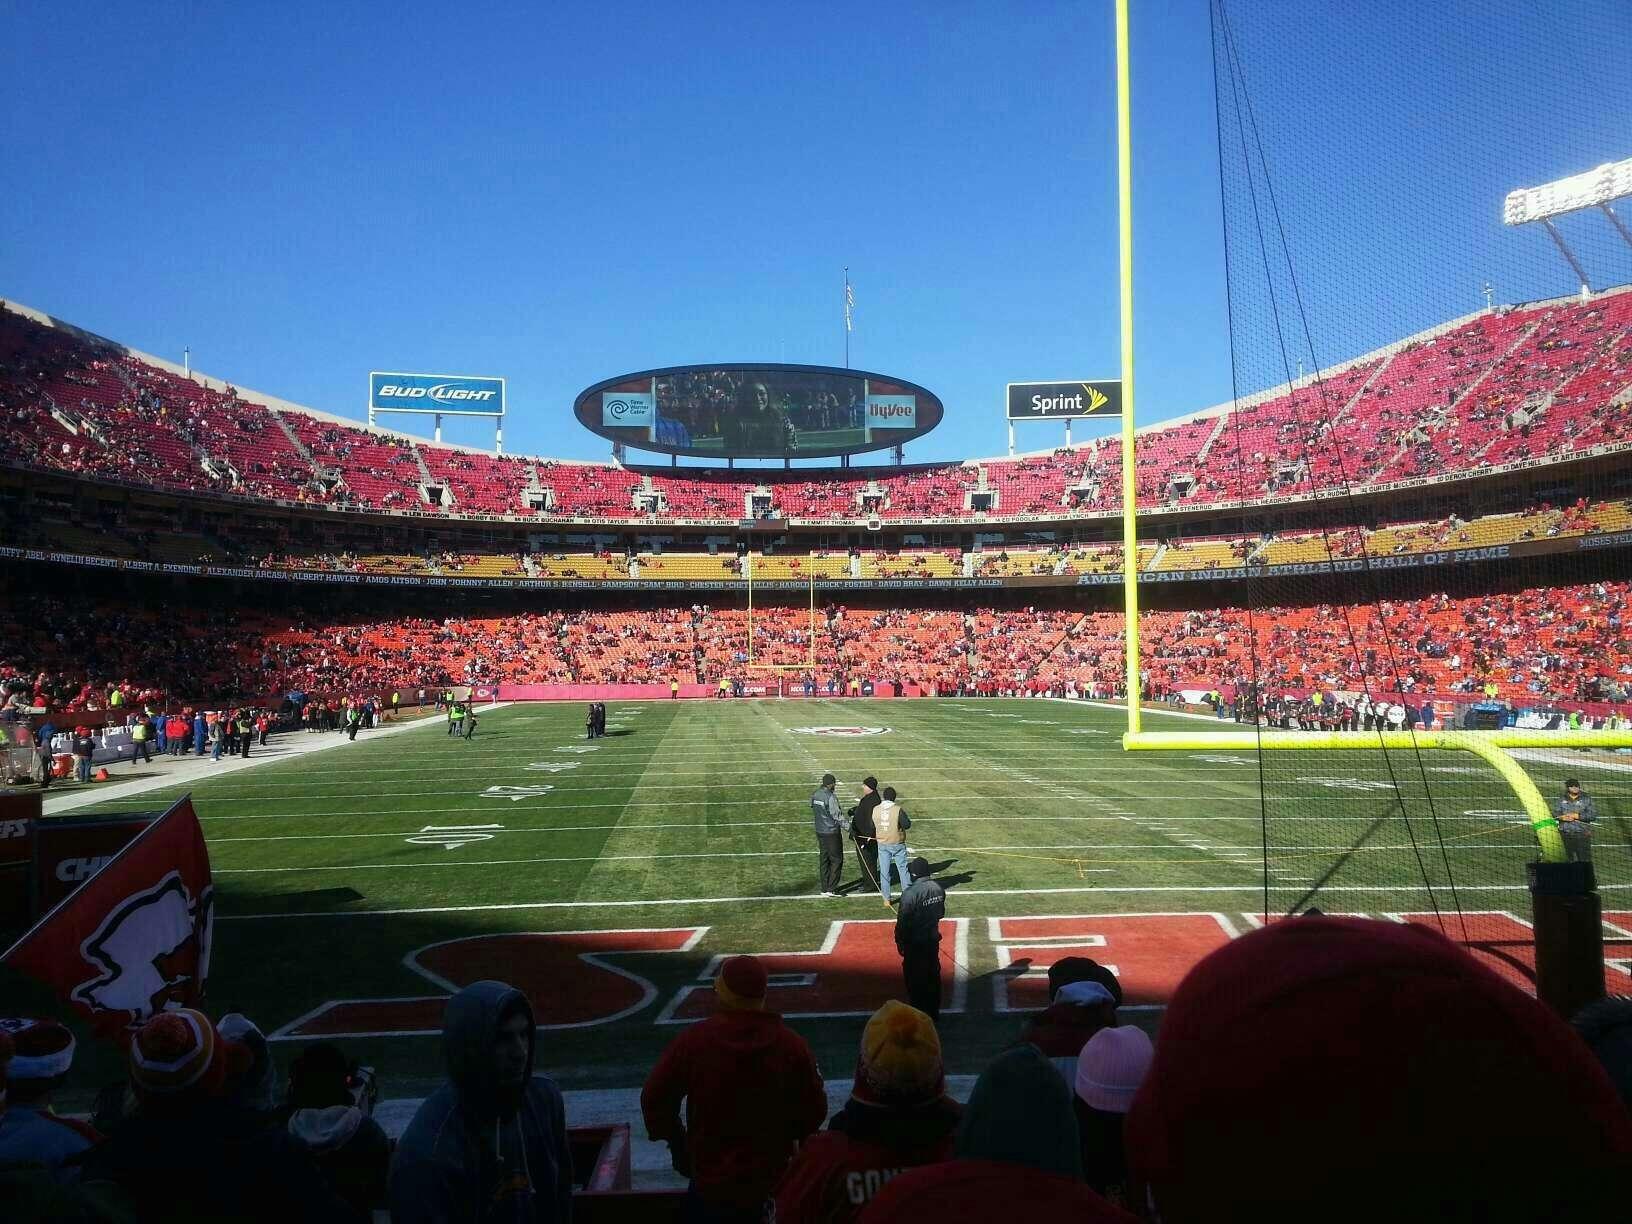 Arrowhead Stadium Section 110 - RateYourSeats.com